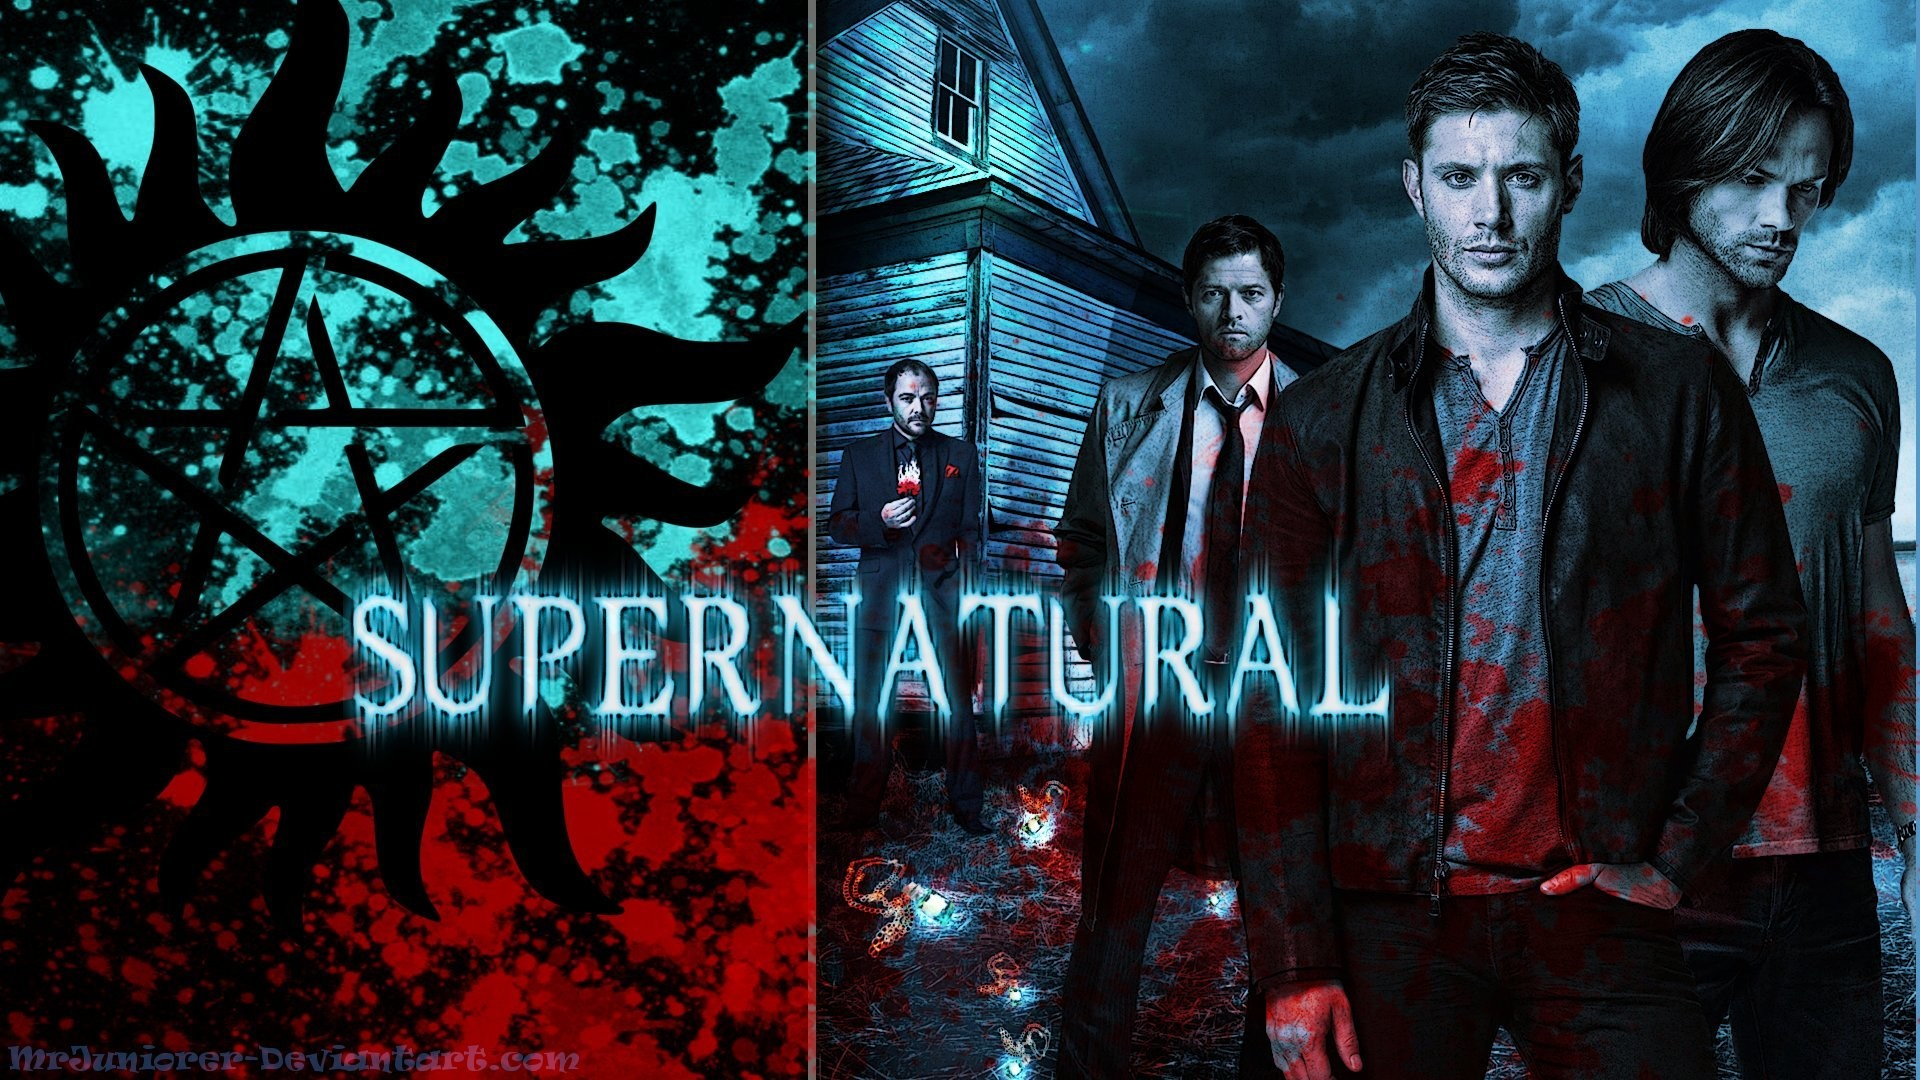 Supernatural Wallpaper by MrJuniorer Supernatural Wallpaper by MrJuniorer